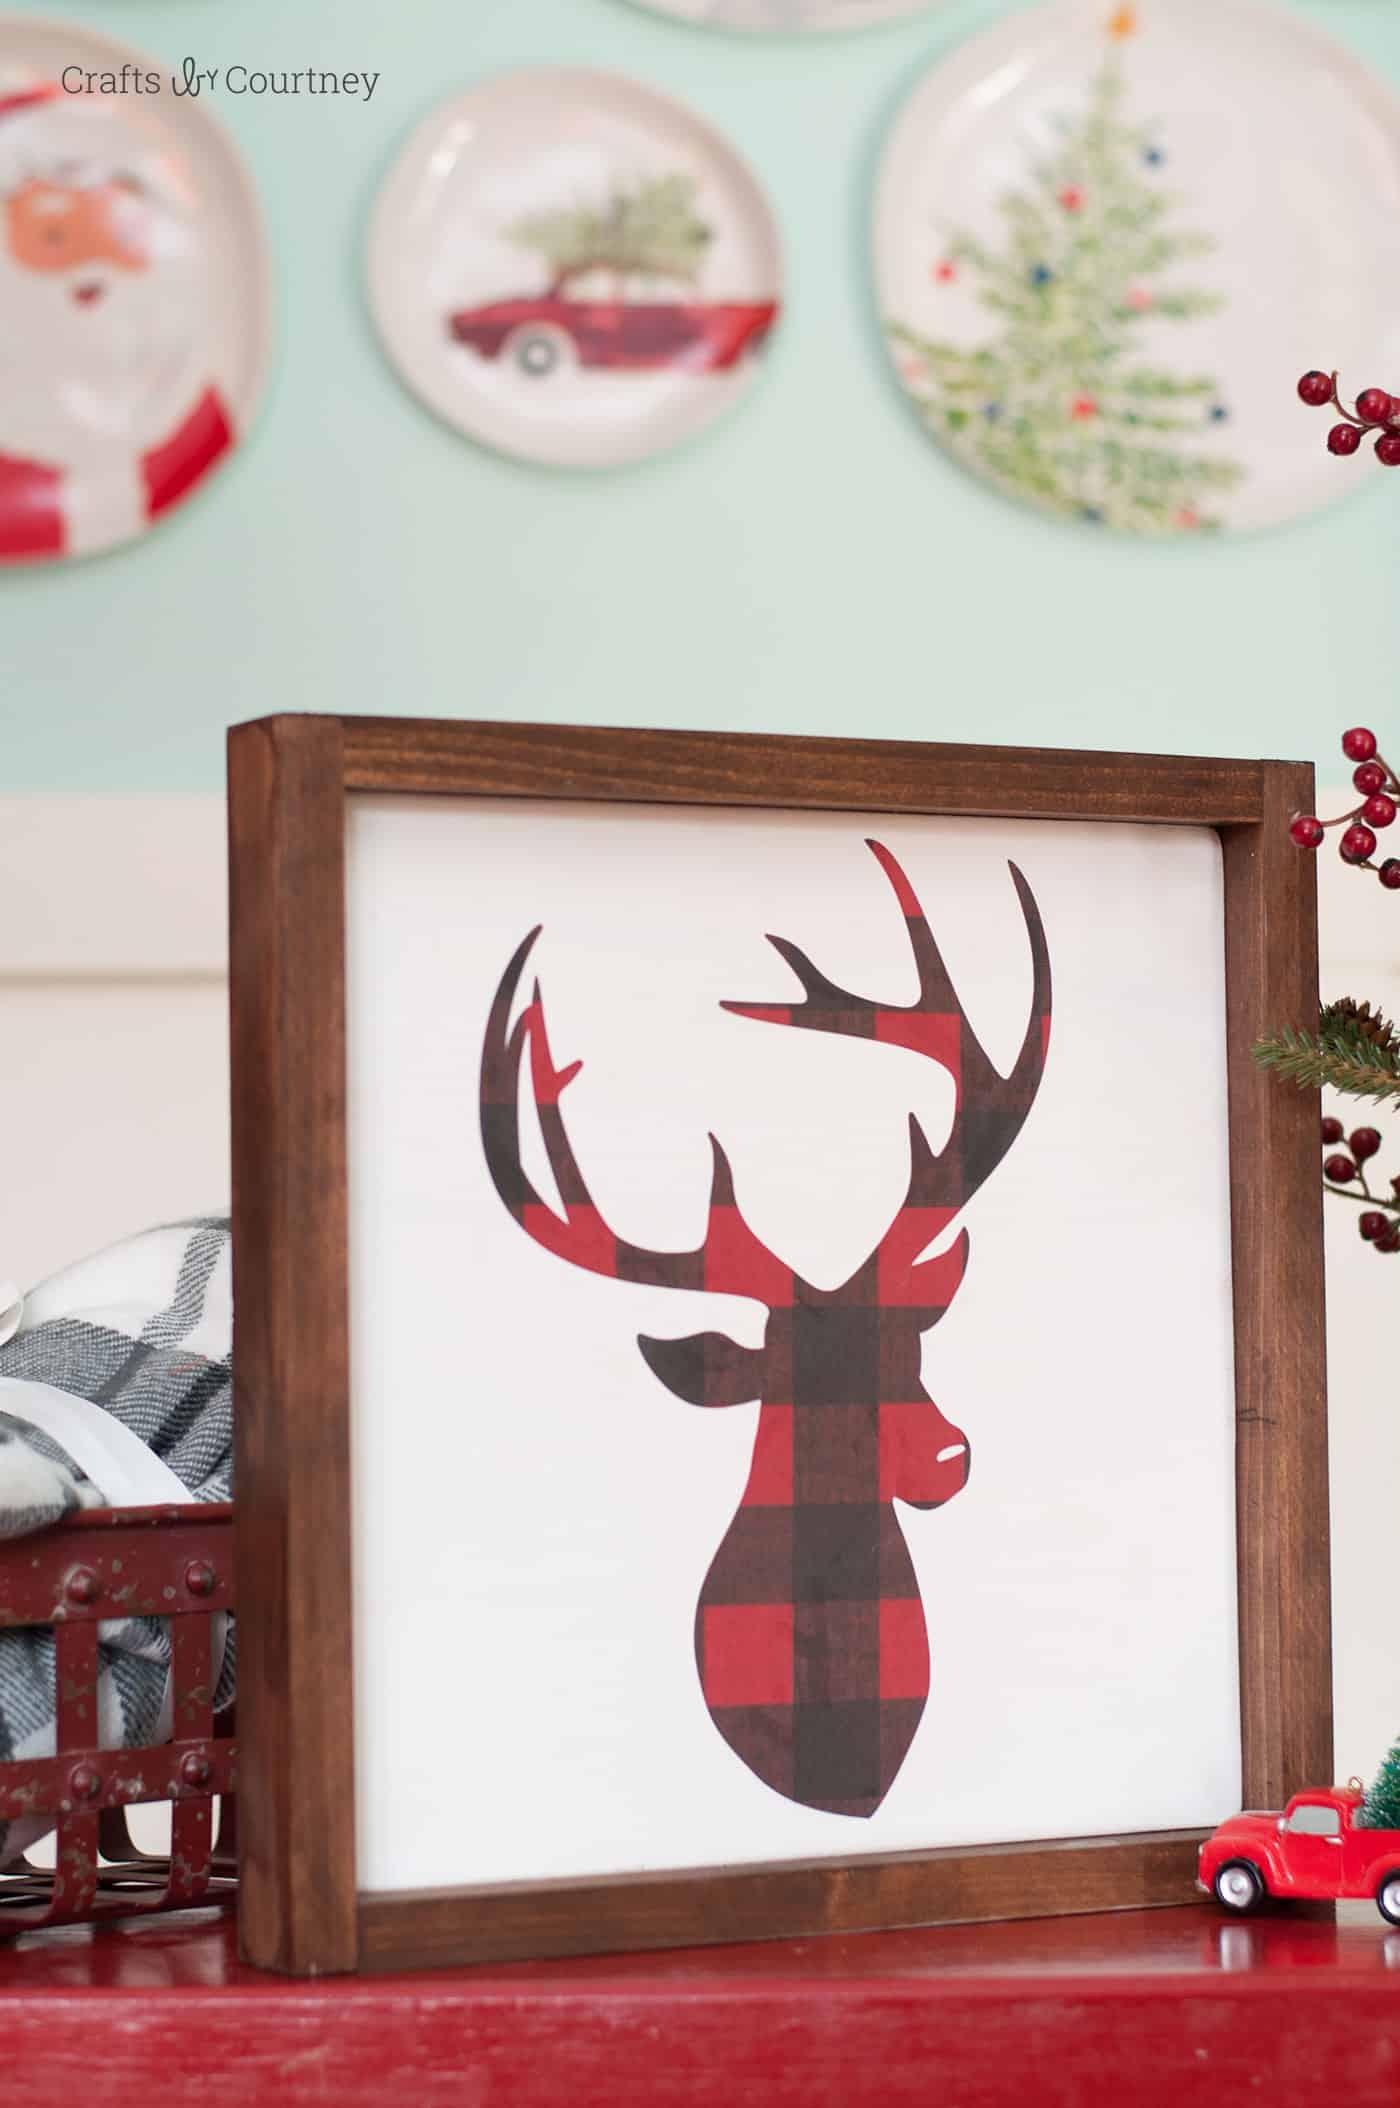 Handmade DIY Christmas sign featuring a buffalo plaid deer